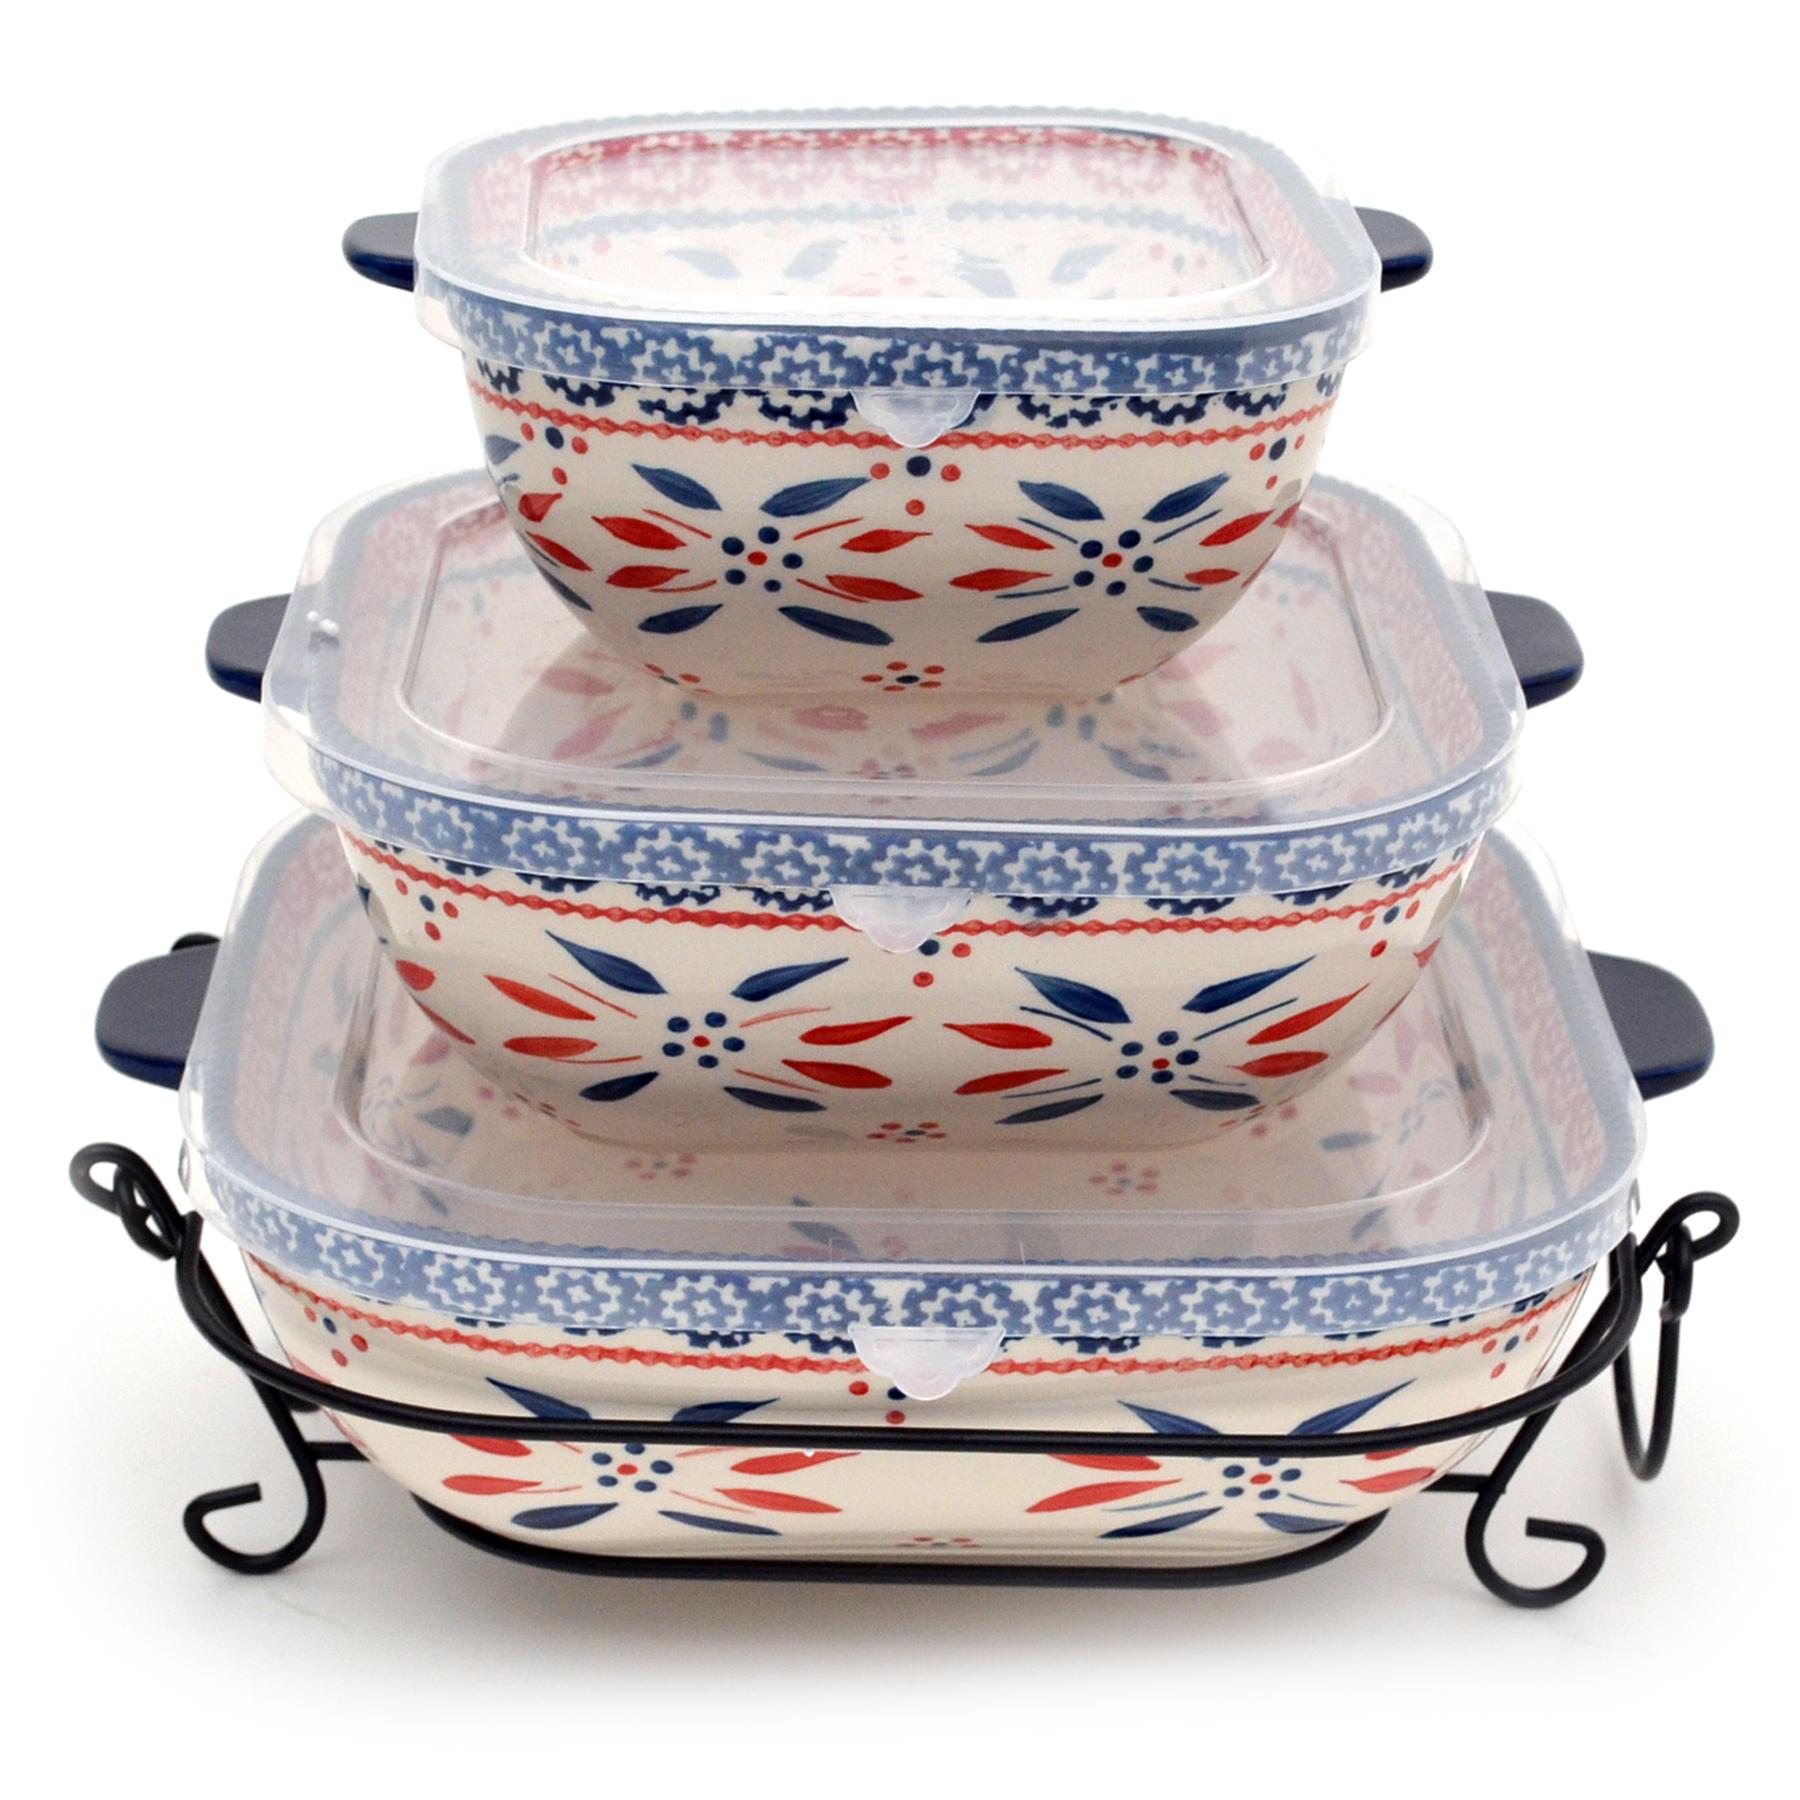 temp-tations® Old World Nested Square Bakerware Set – 3 Piece – Fireworkfetti